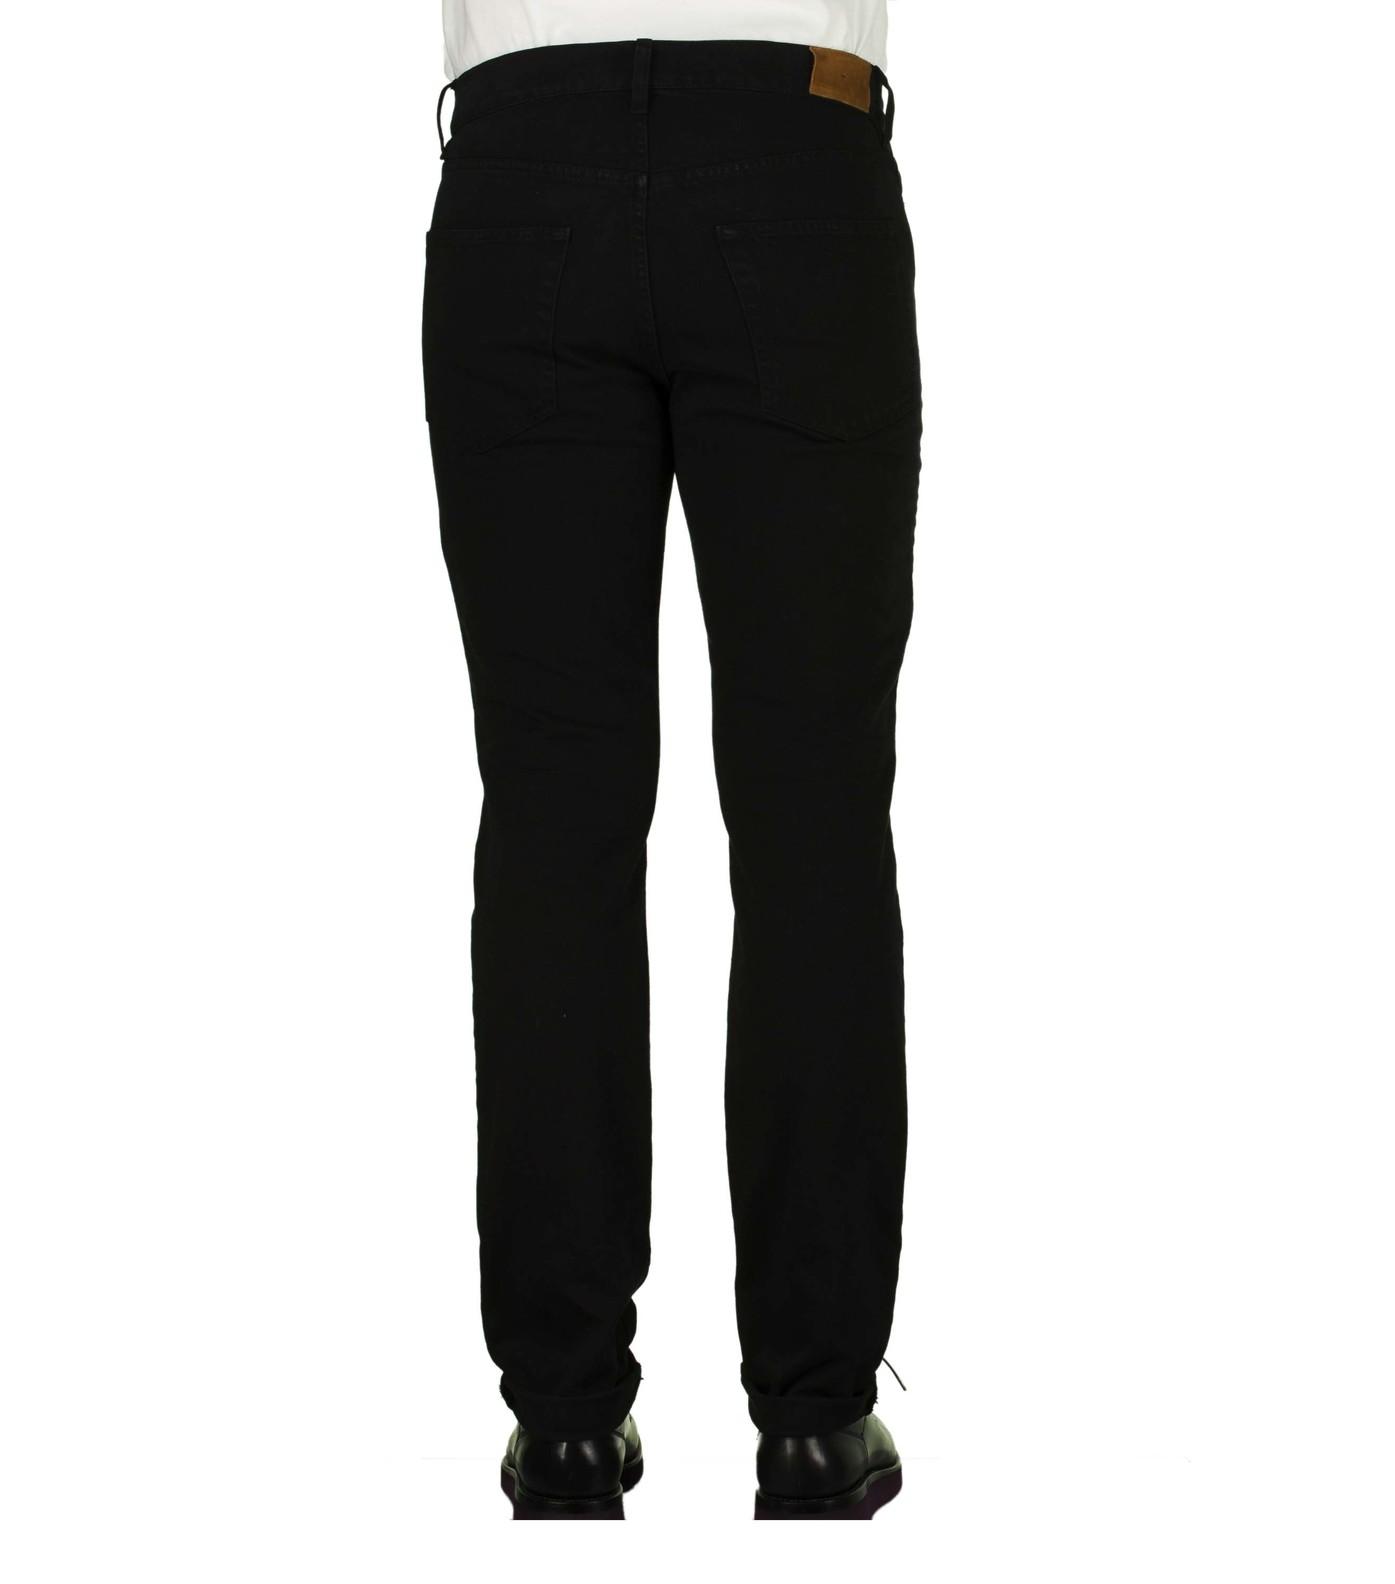 Pants GN.DENIM - Black